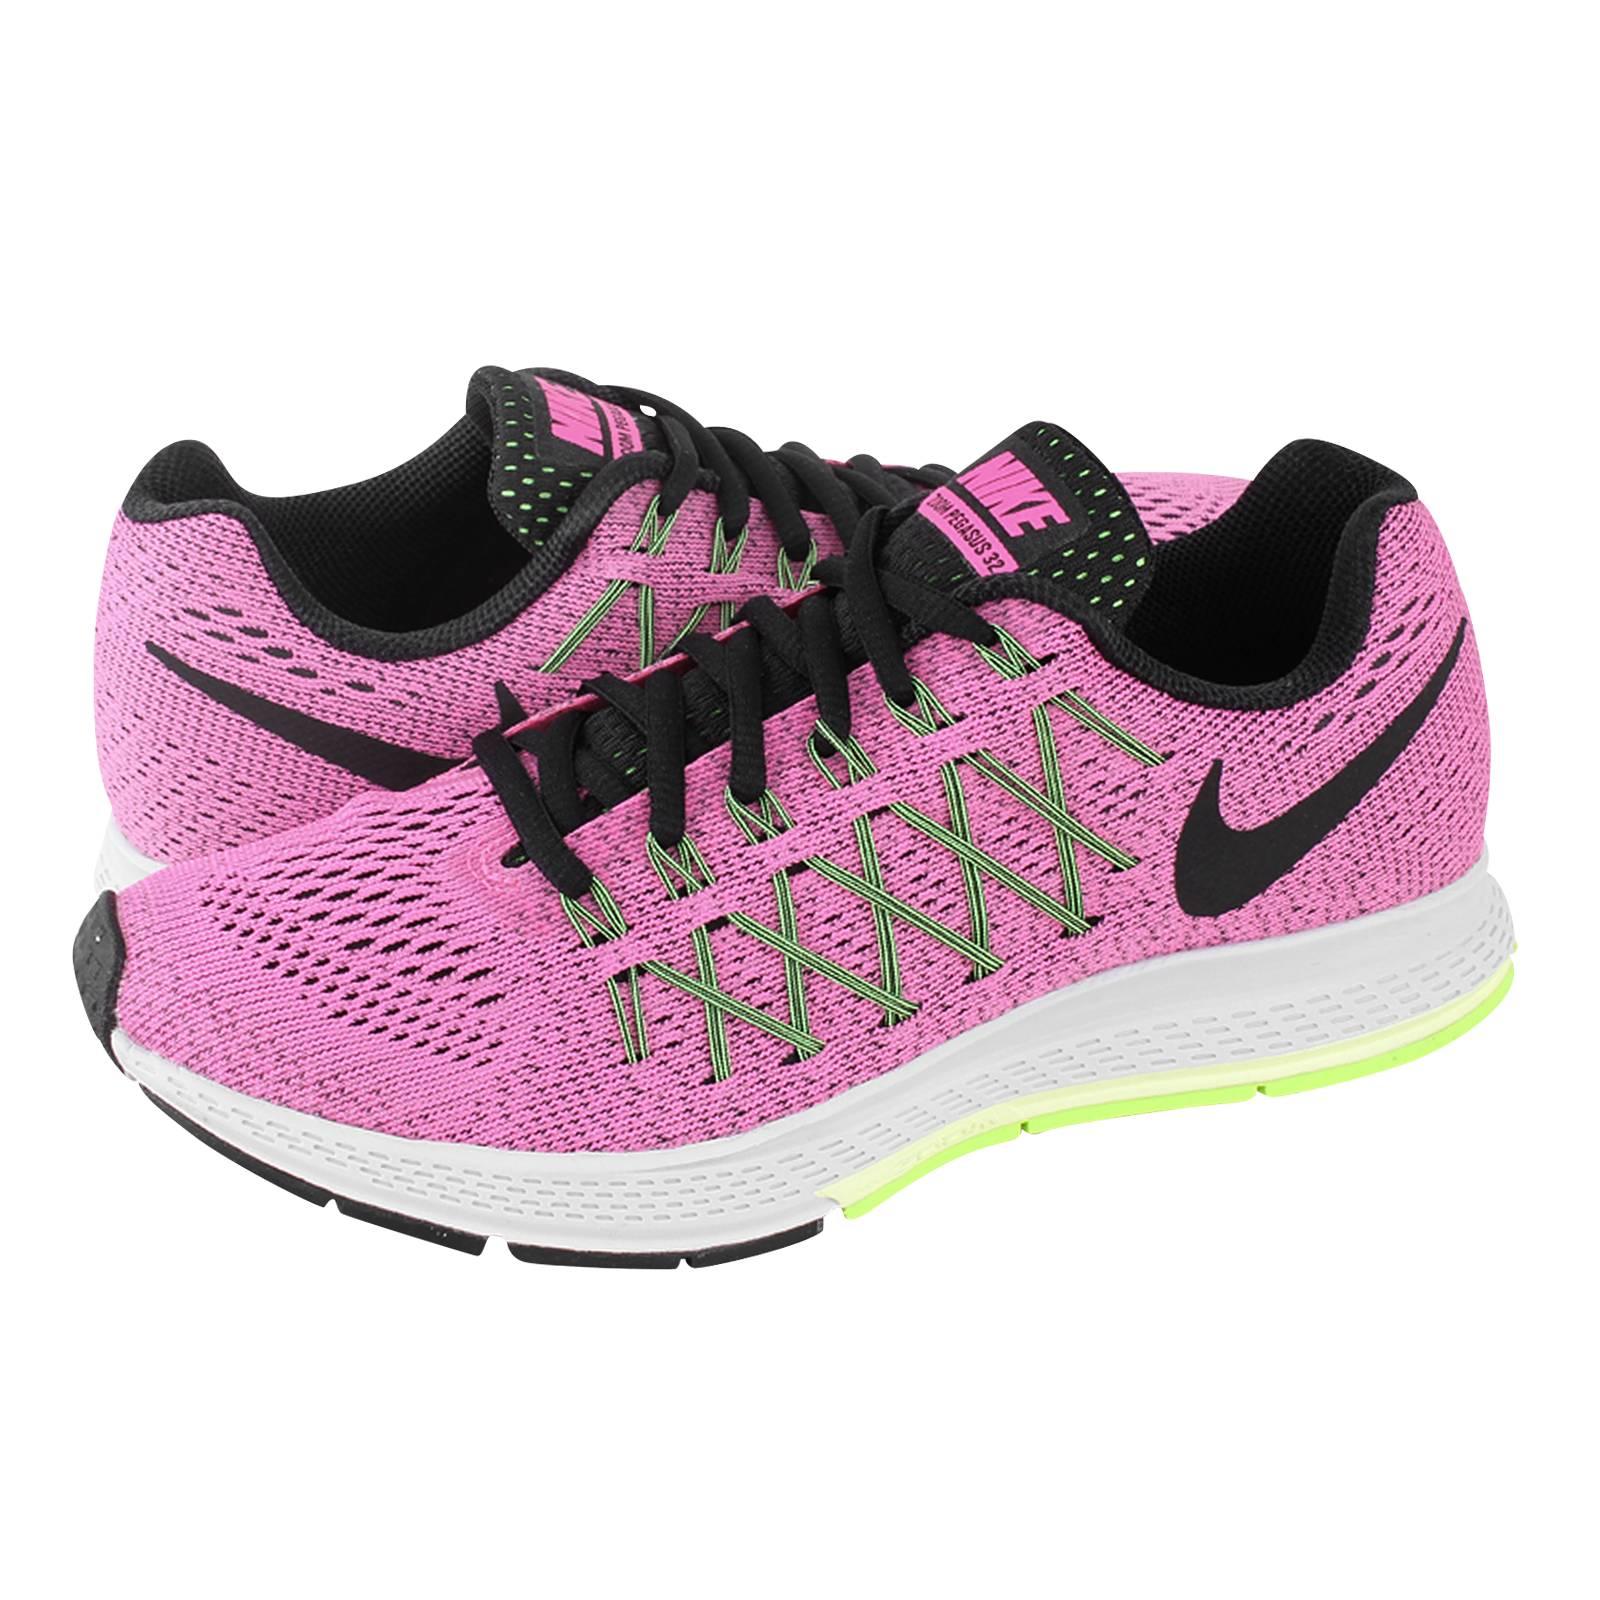 fec34acbf74 Air Zoom Pegasus 32 - Γυναικεία αθλητικά παπούτσια Nike από υφασμα ...